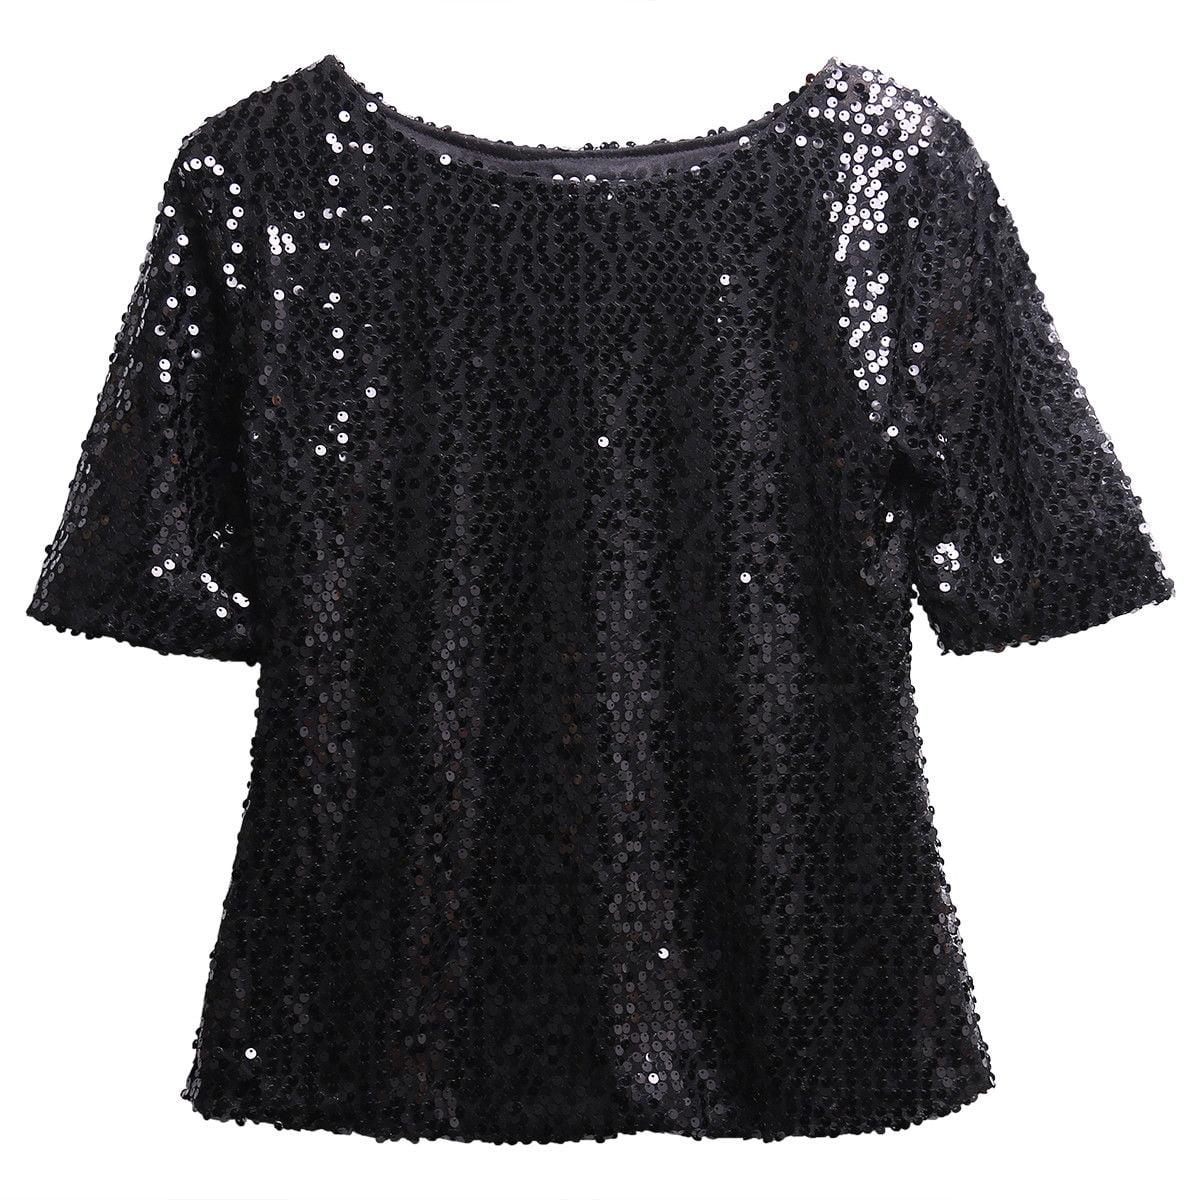 467f5a29 Hirigin - Ladies Sloping Shoulder Glistening Sequin Slim Shirt Tops Blouses  Women T Shirts Embellished Sparkle Tunic Blouse - Walmart.com